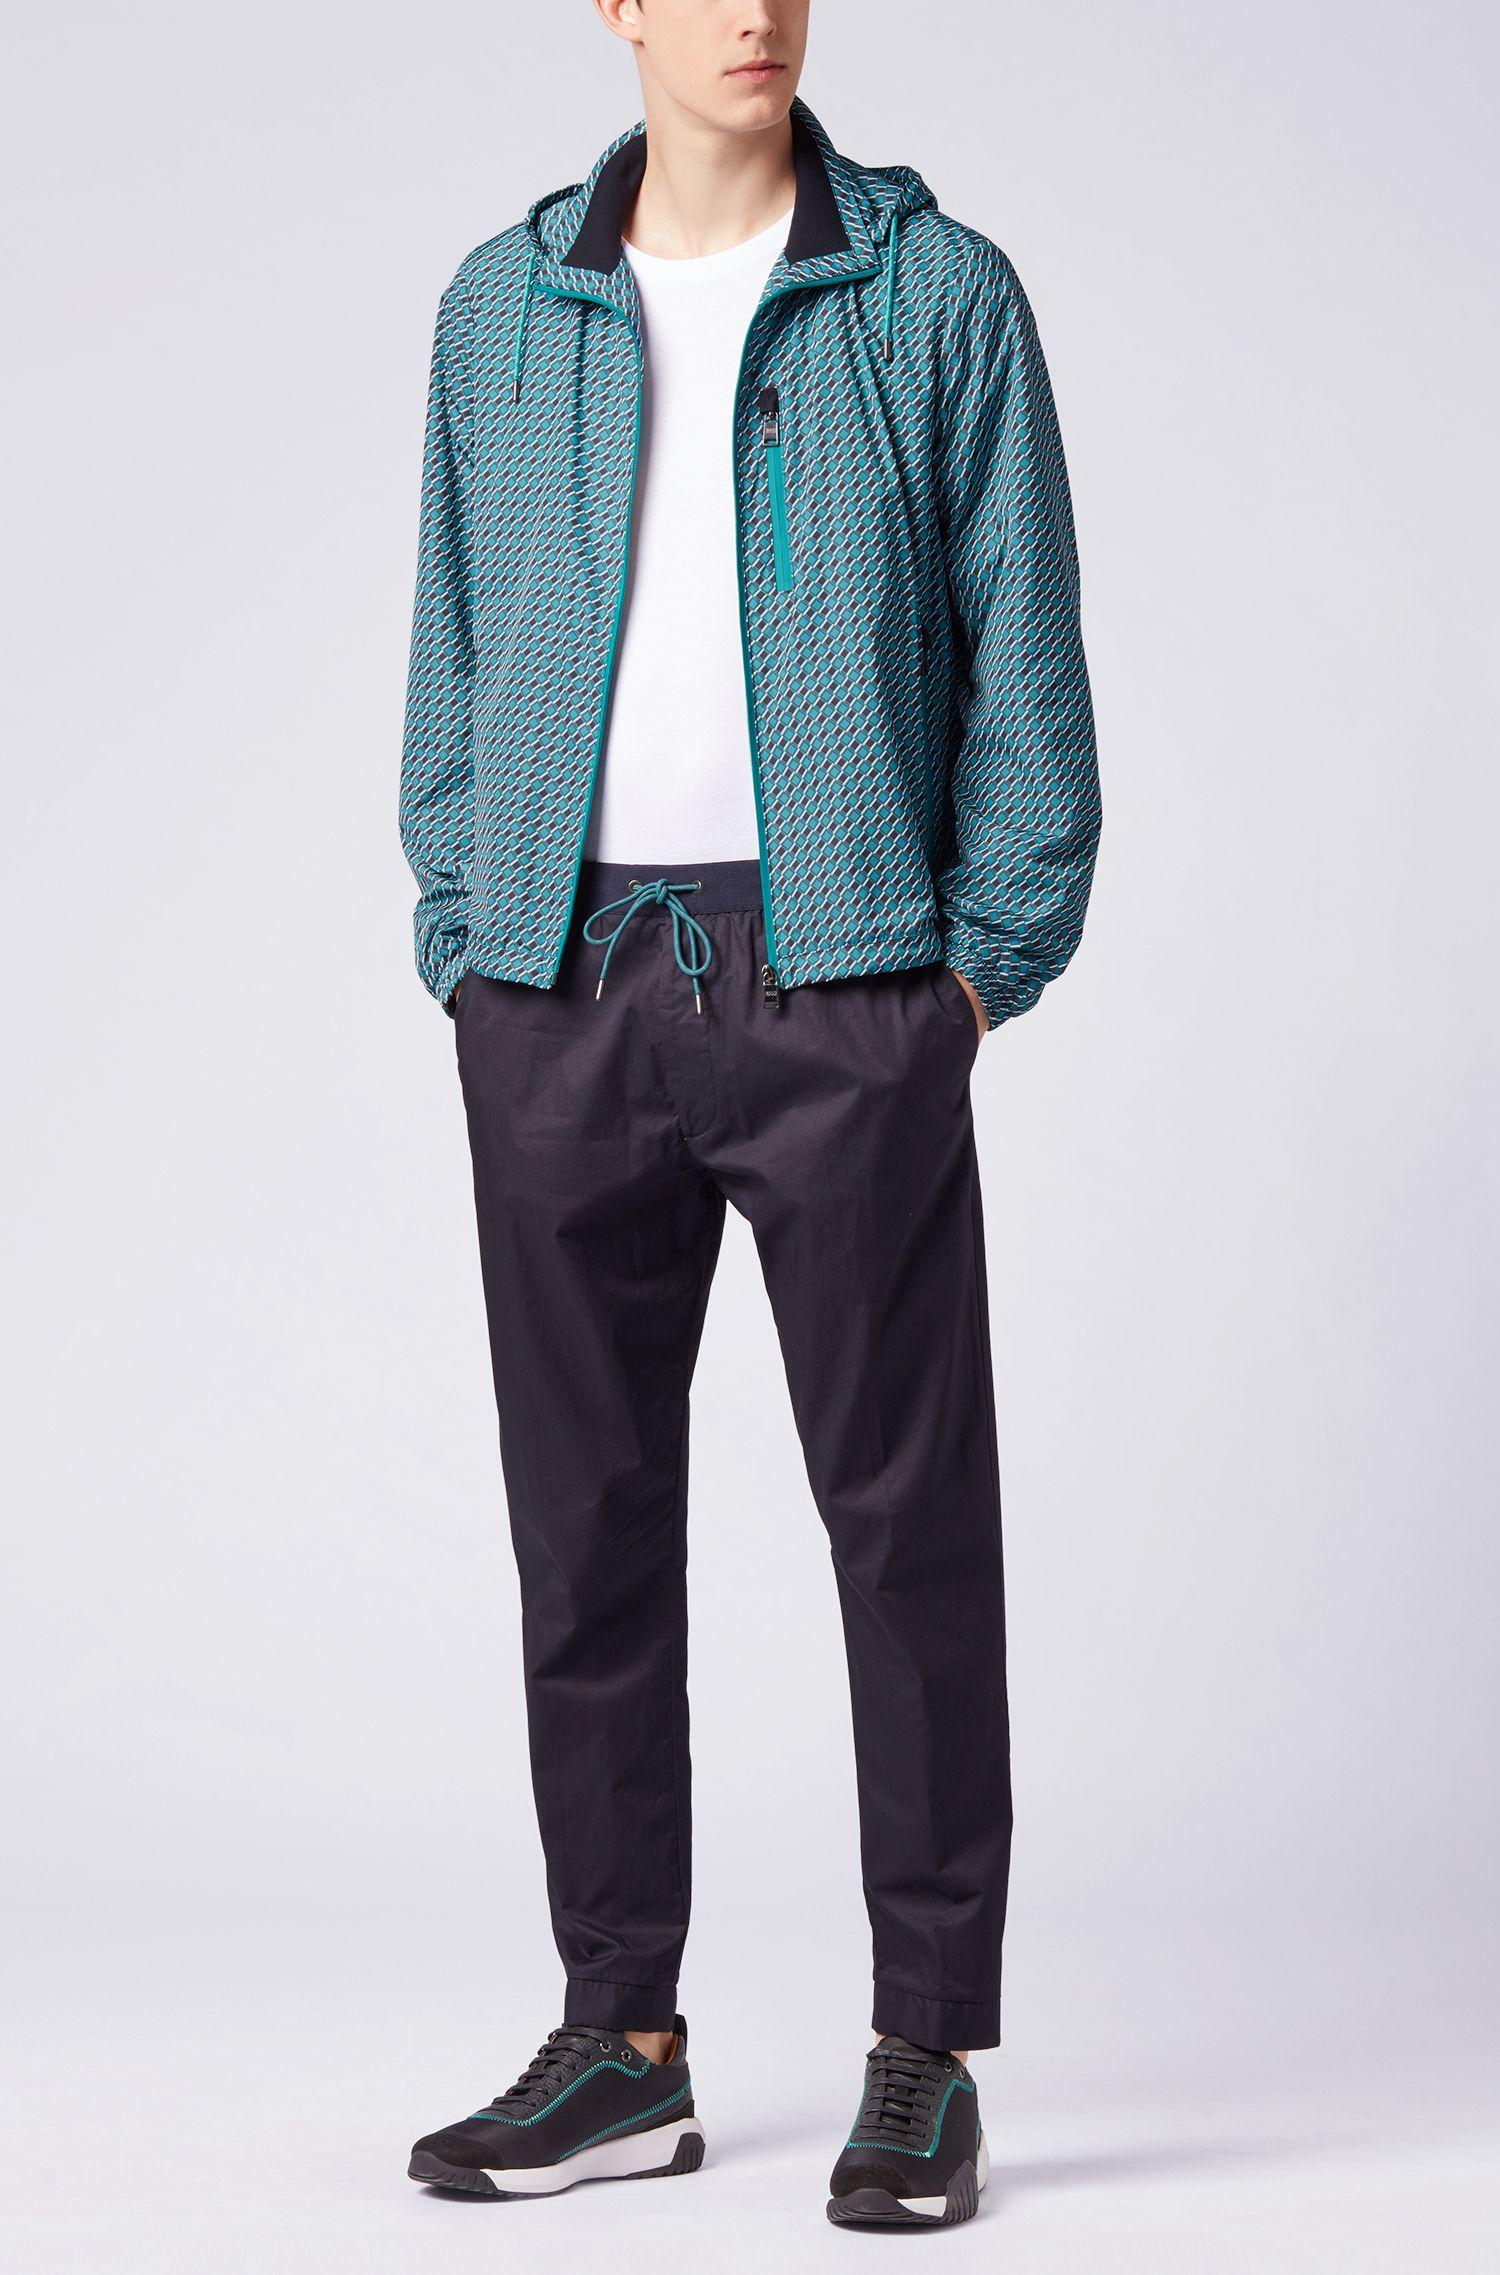 Windbreaker jacket in water-repellent fabric with geometric print